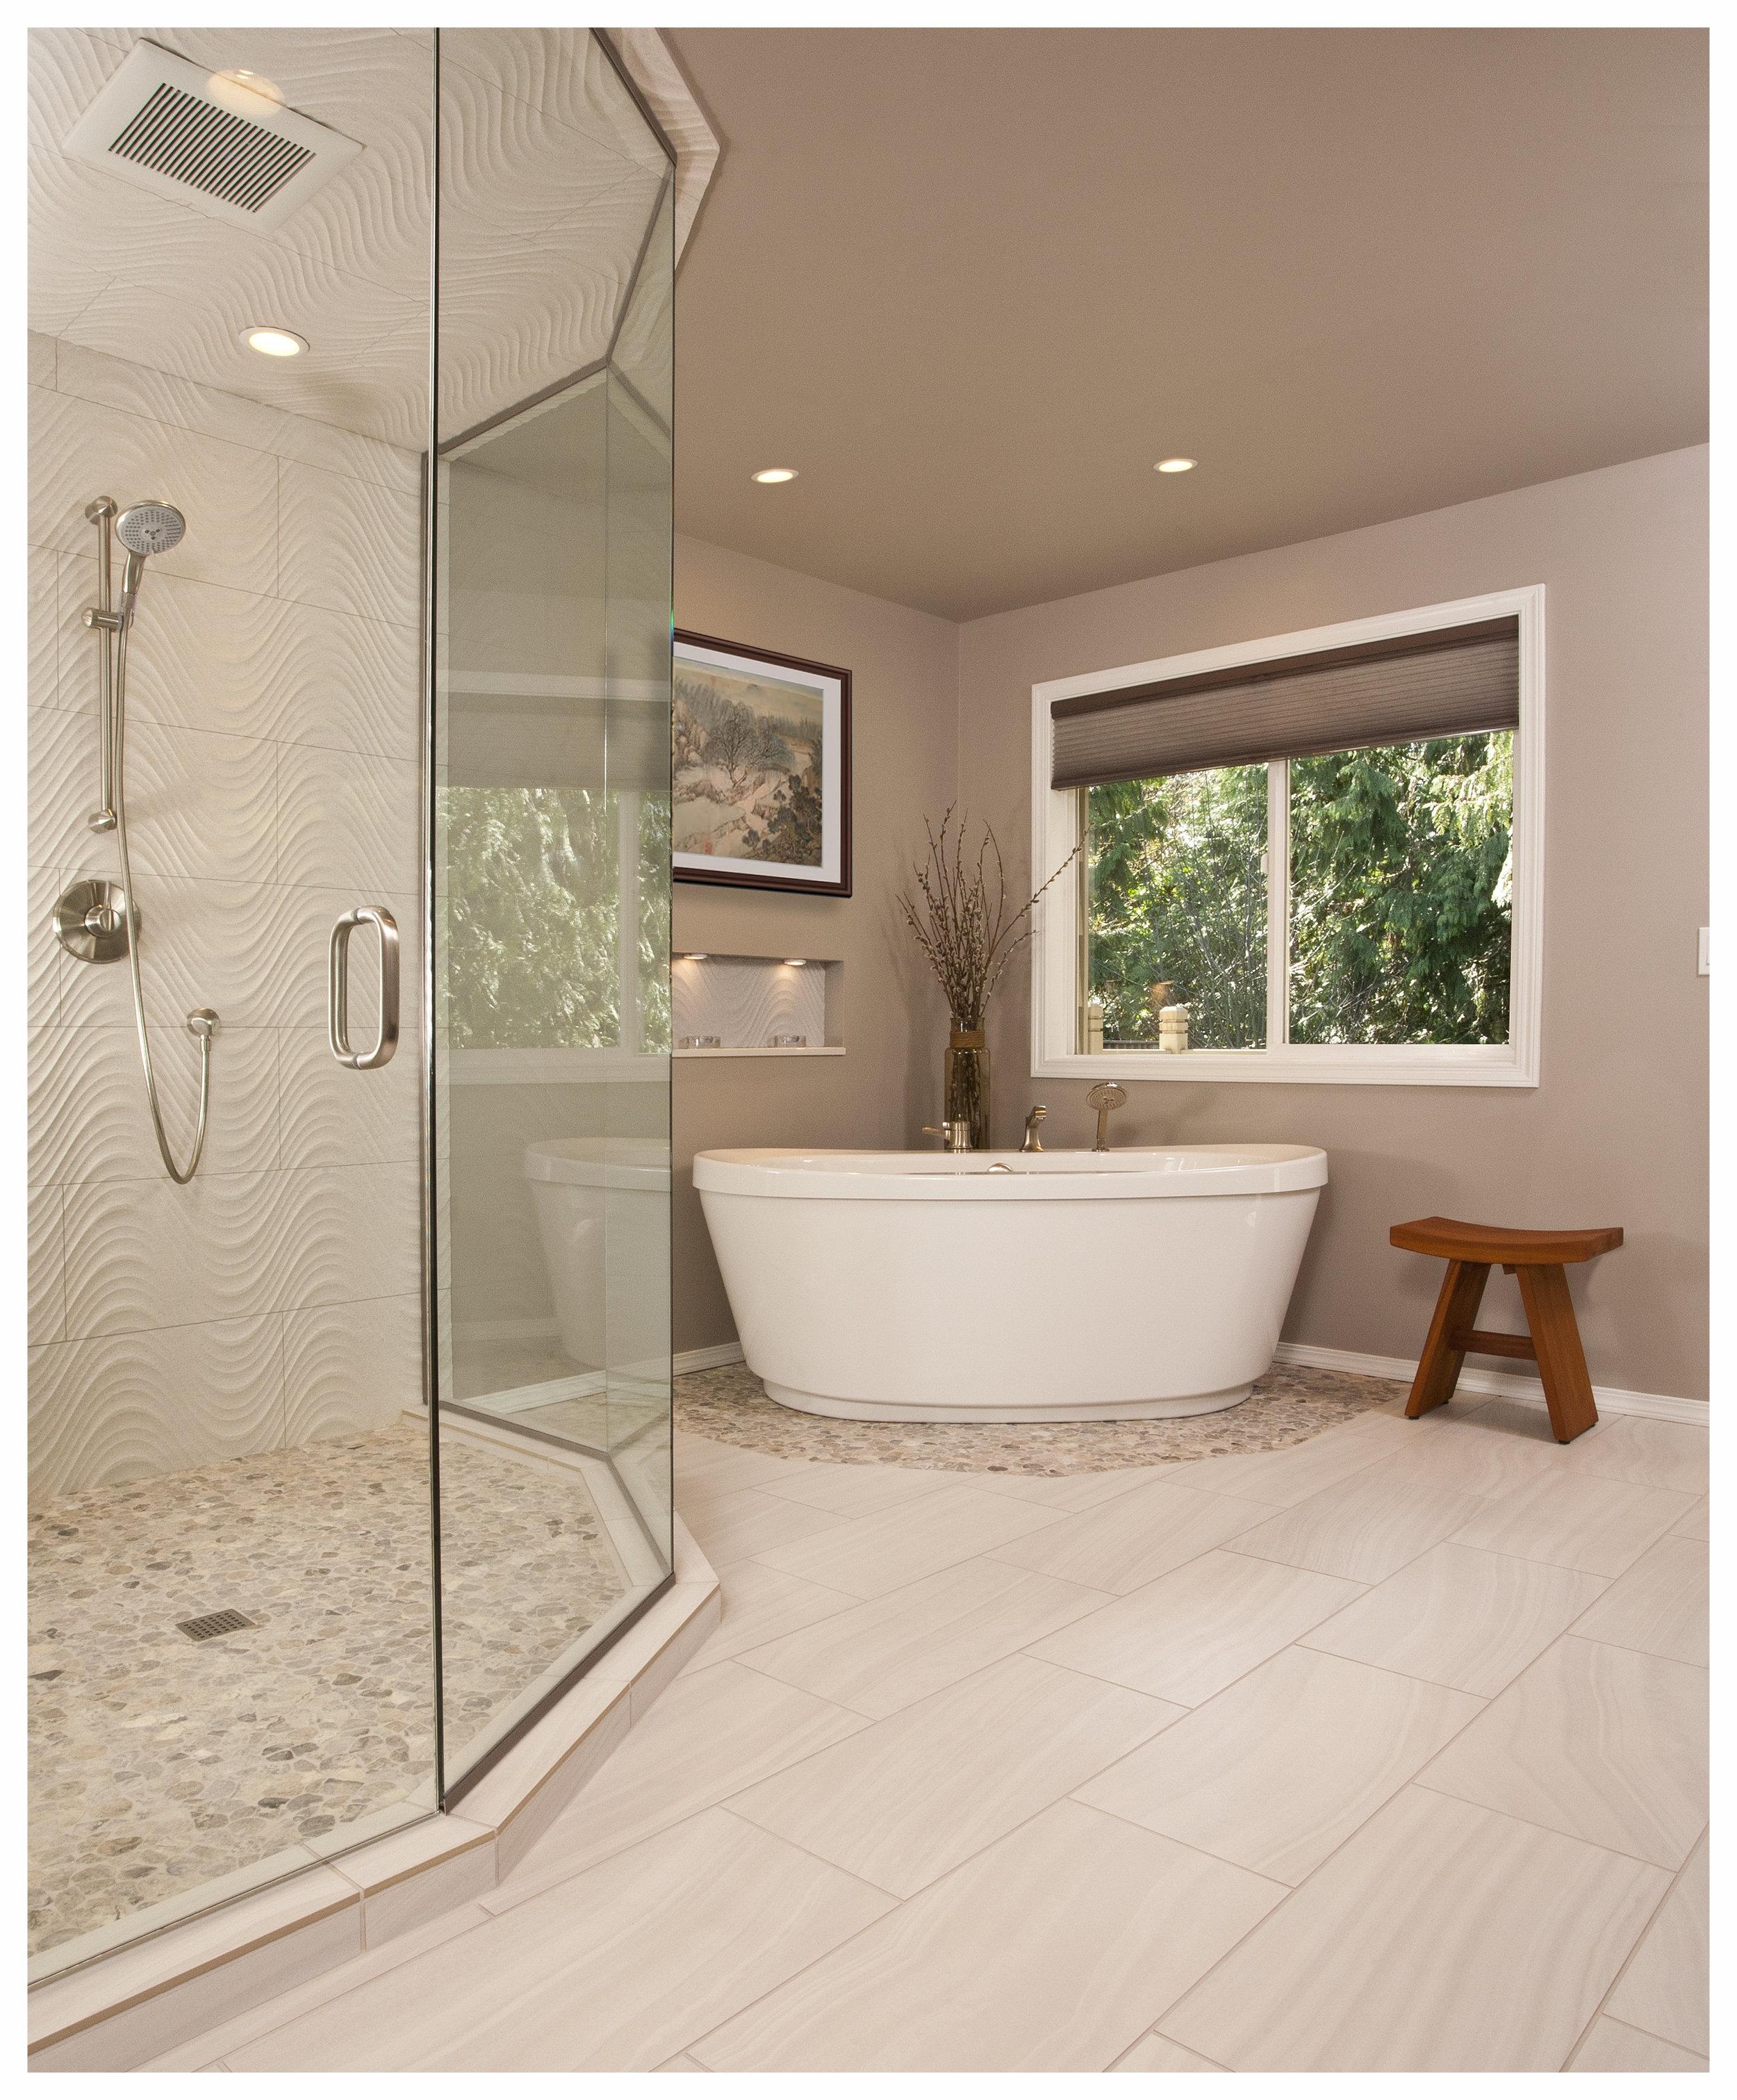 Bellevue Clyde Hill Contemporary Master Bath 4.jpg